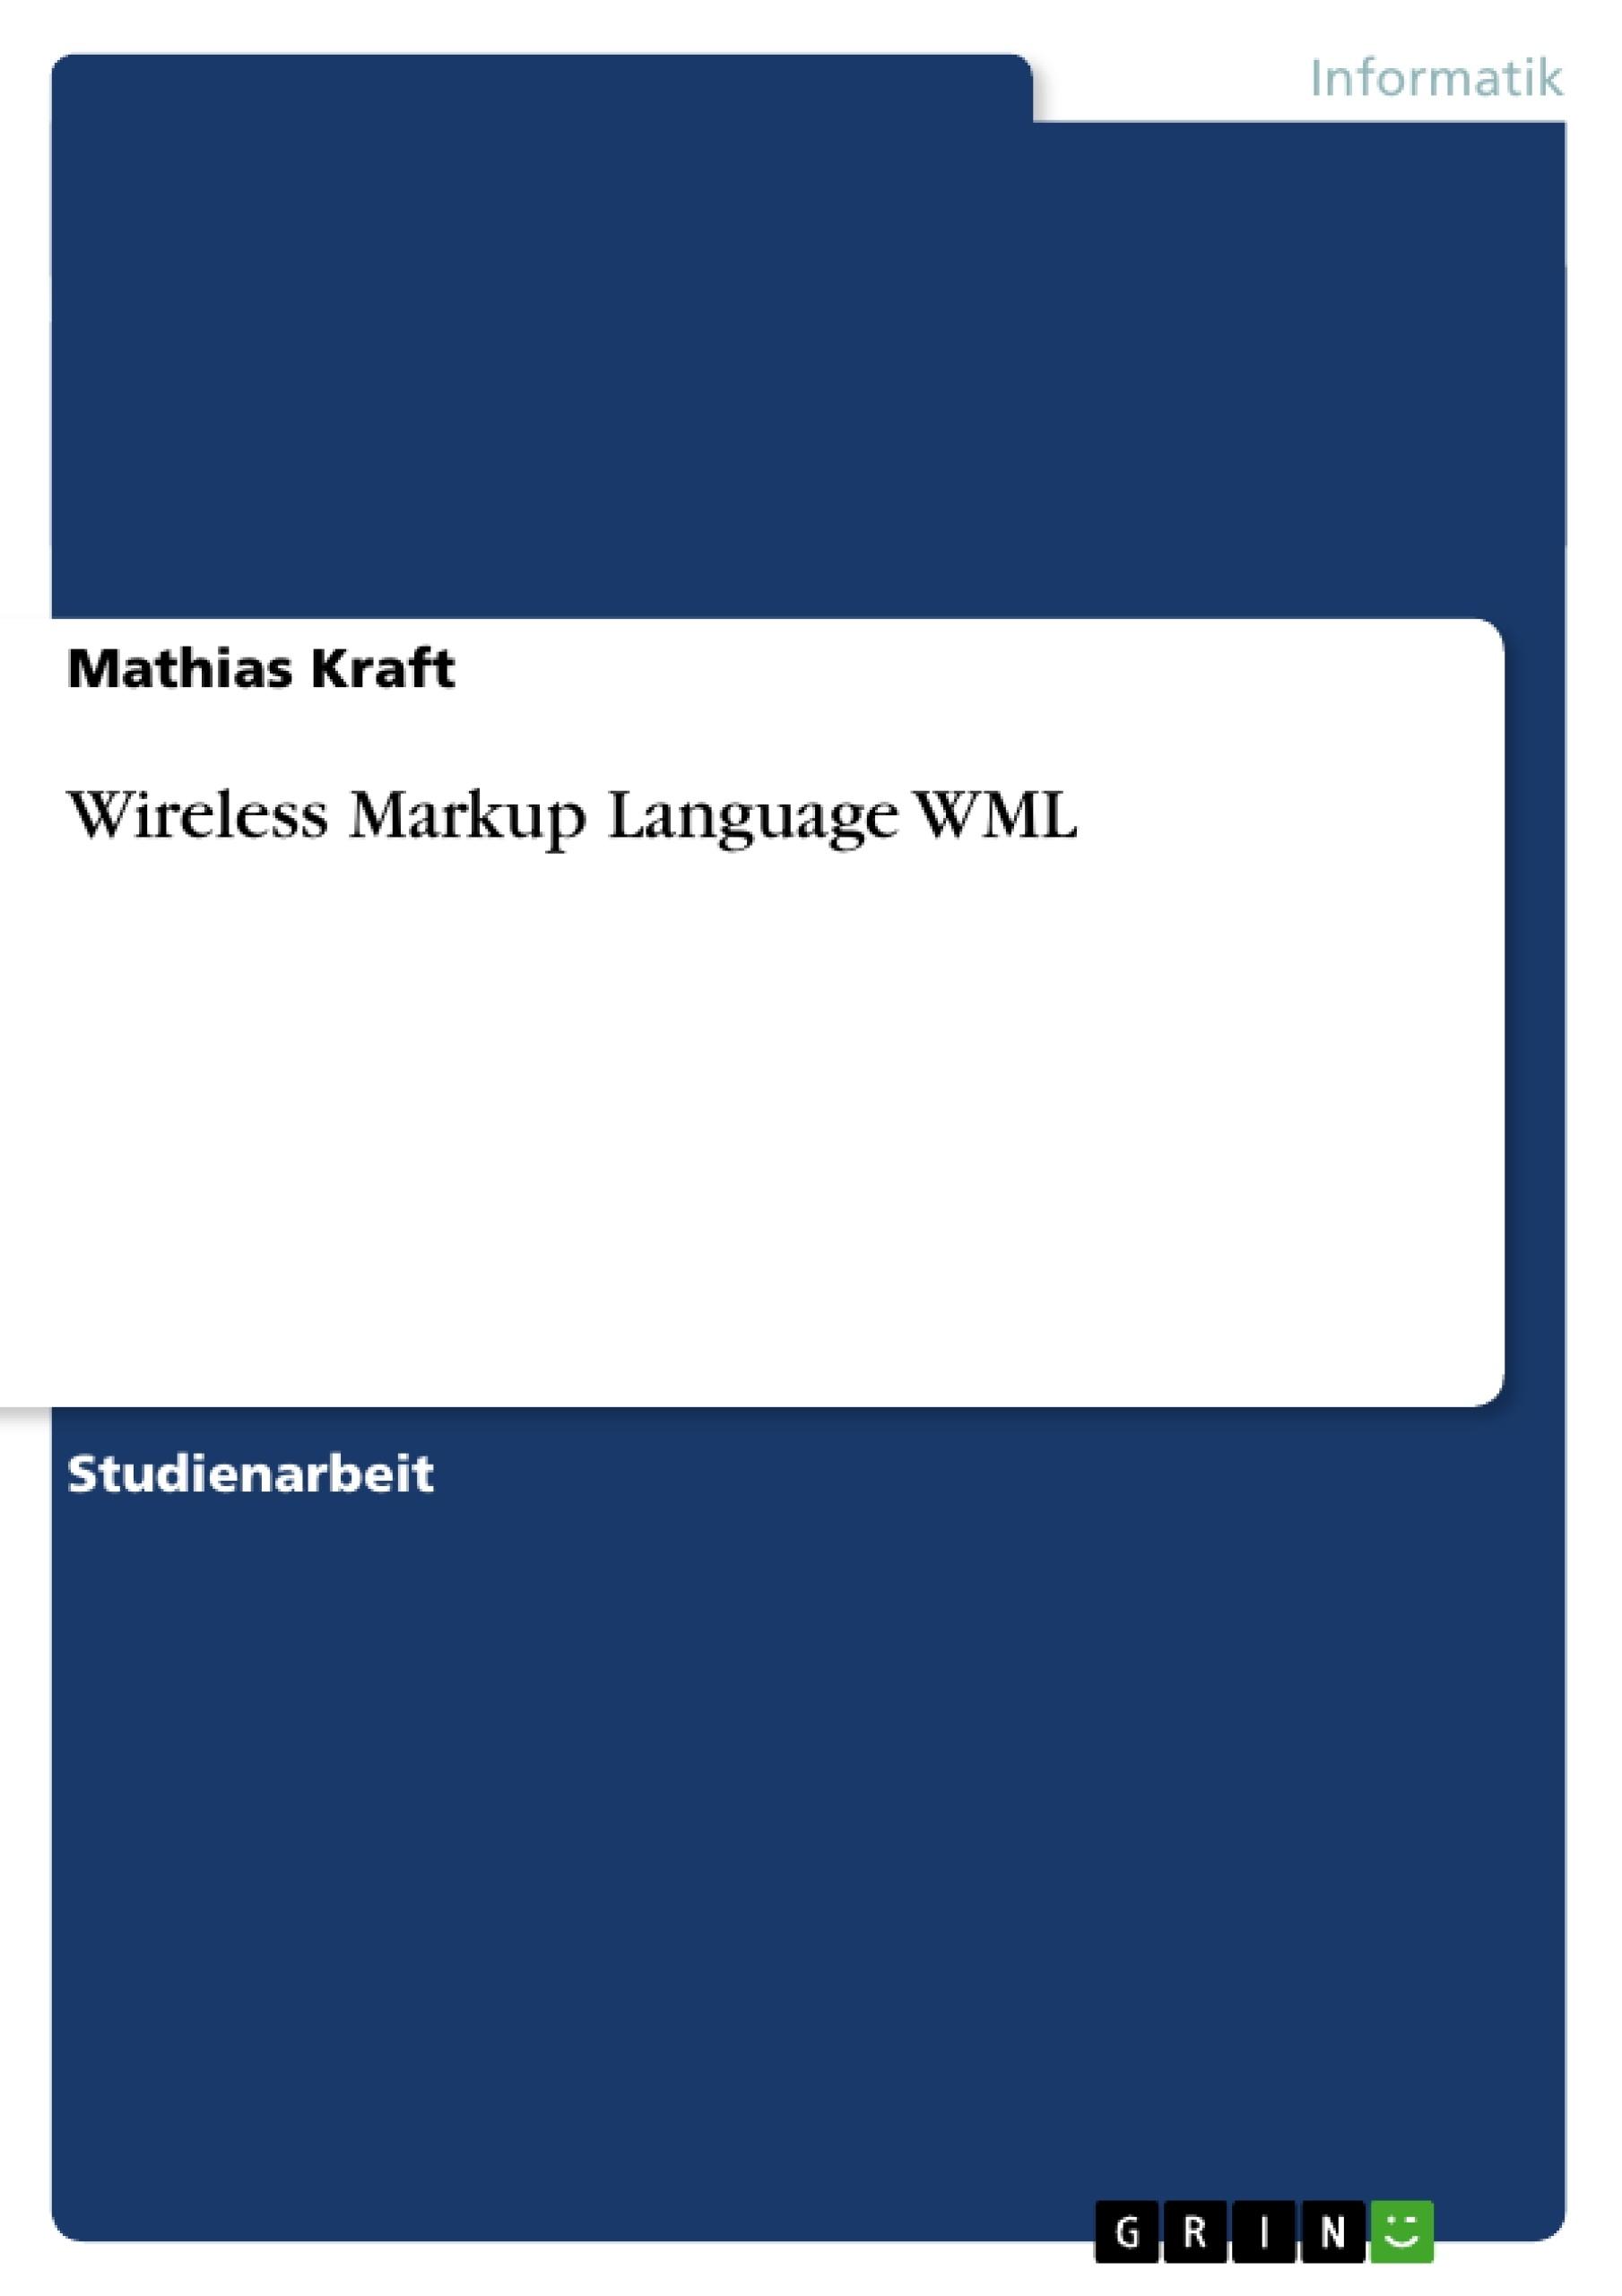 Titel: Wireless Markup Language WML